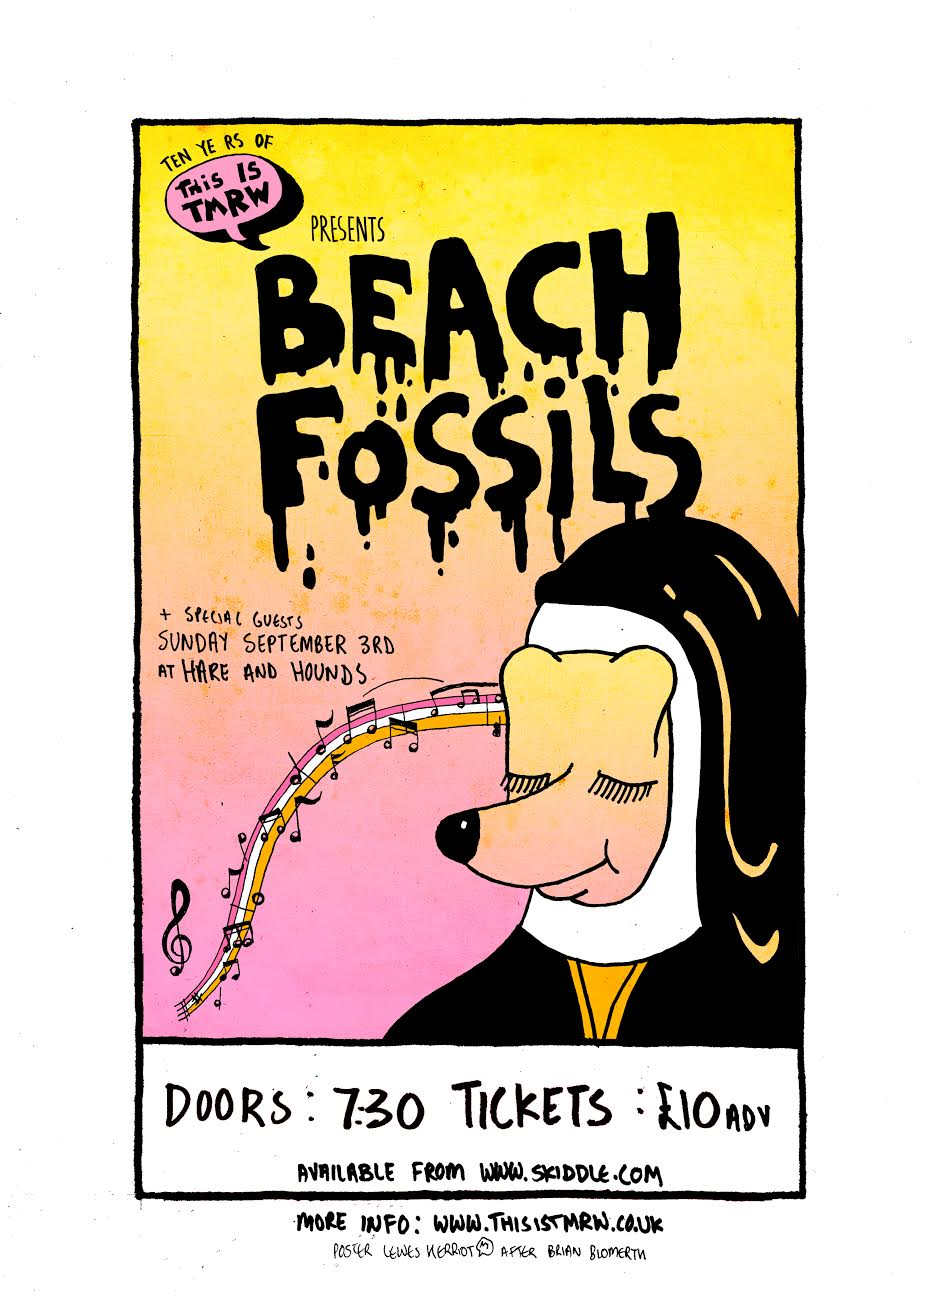 TIT BEACH FOSSILS